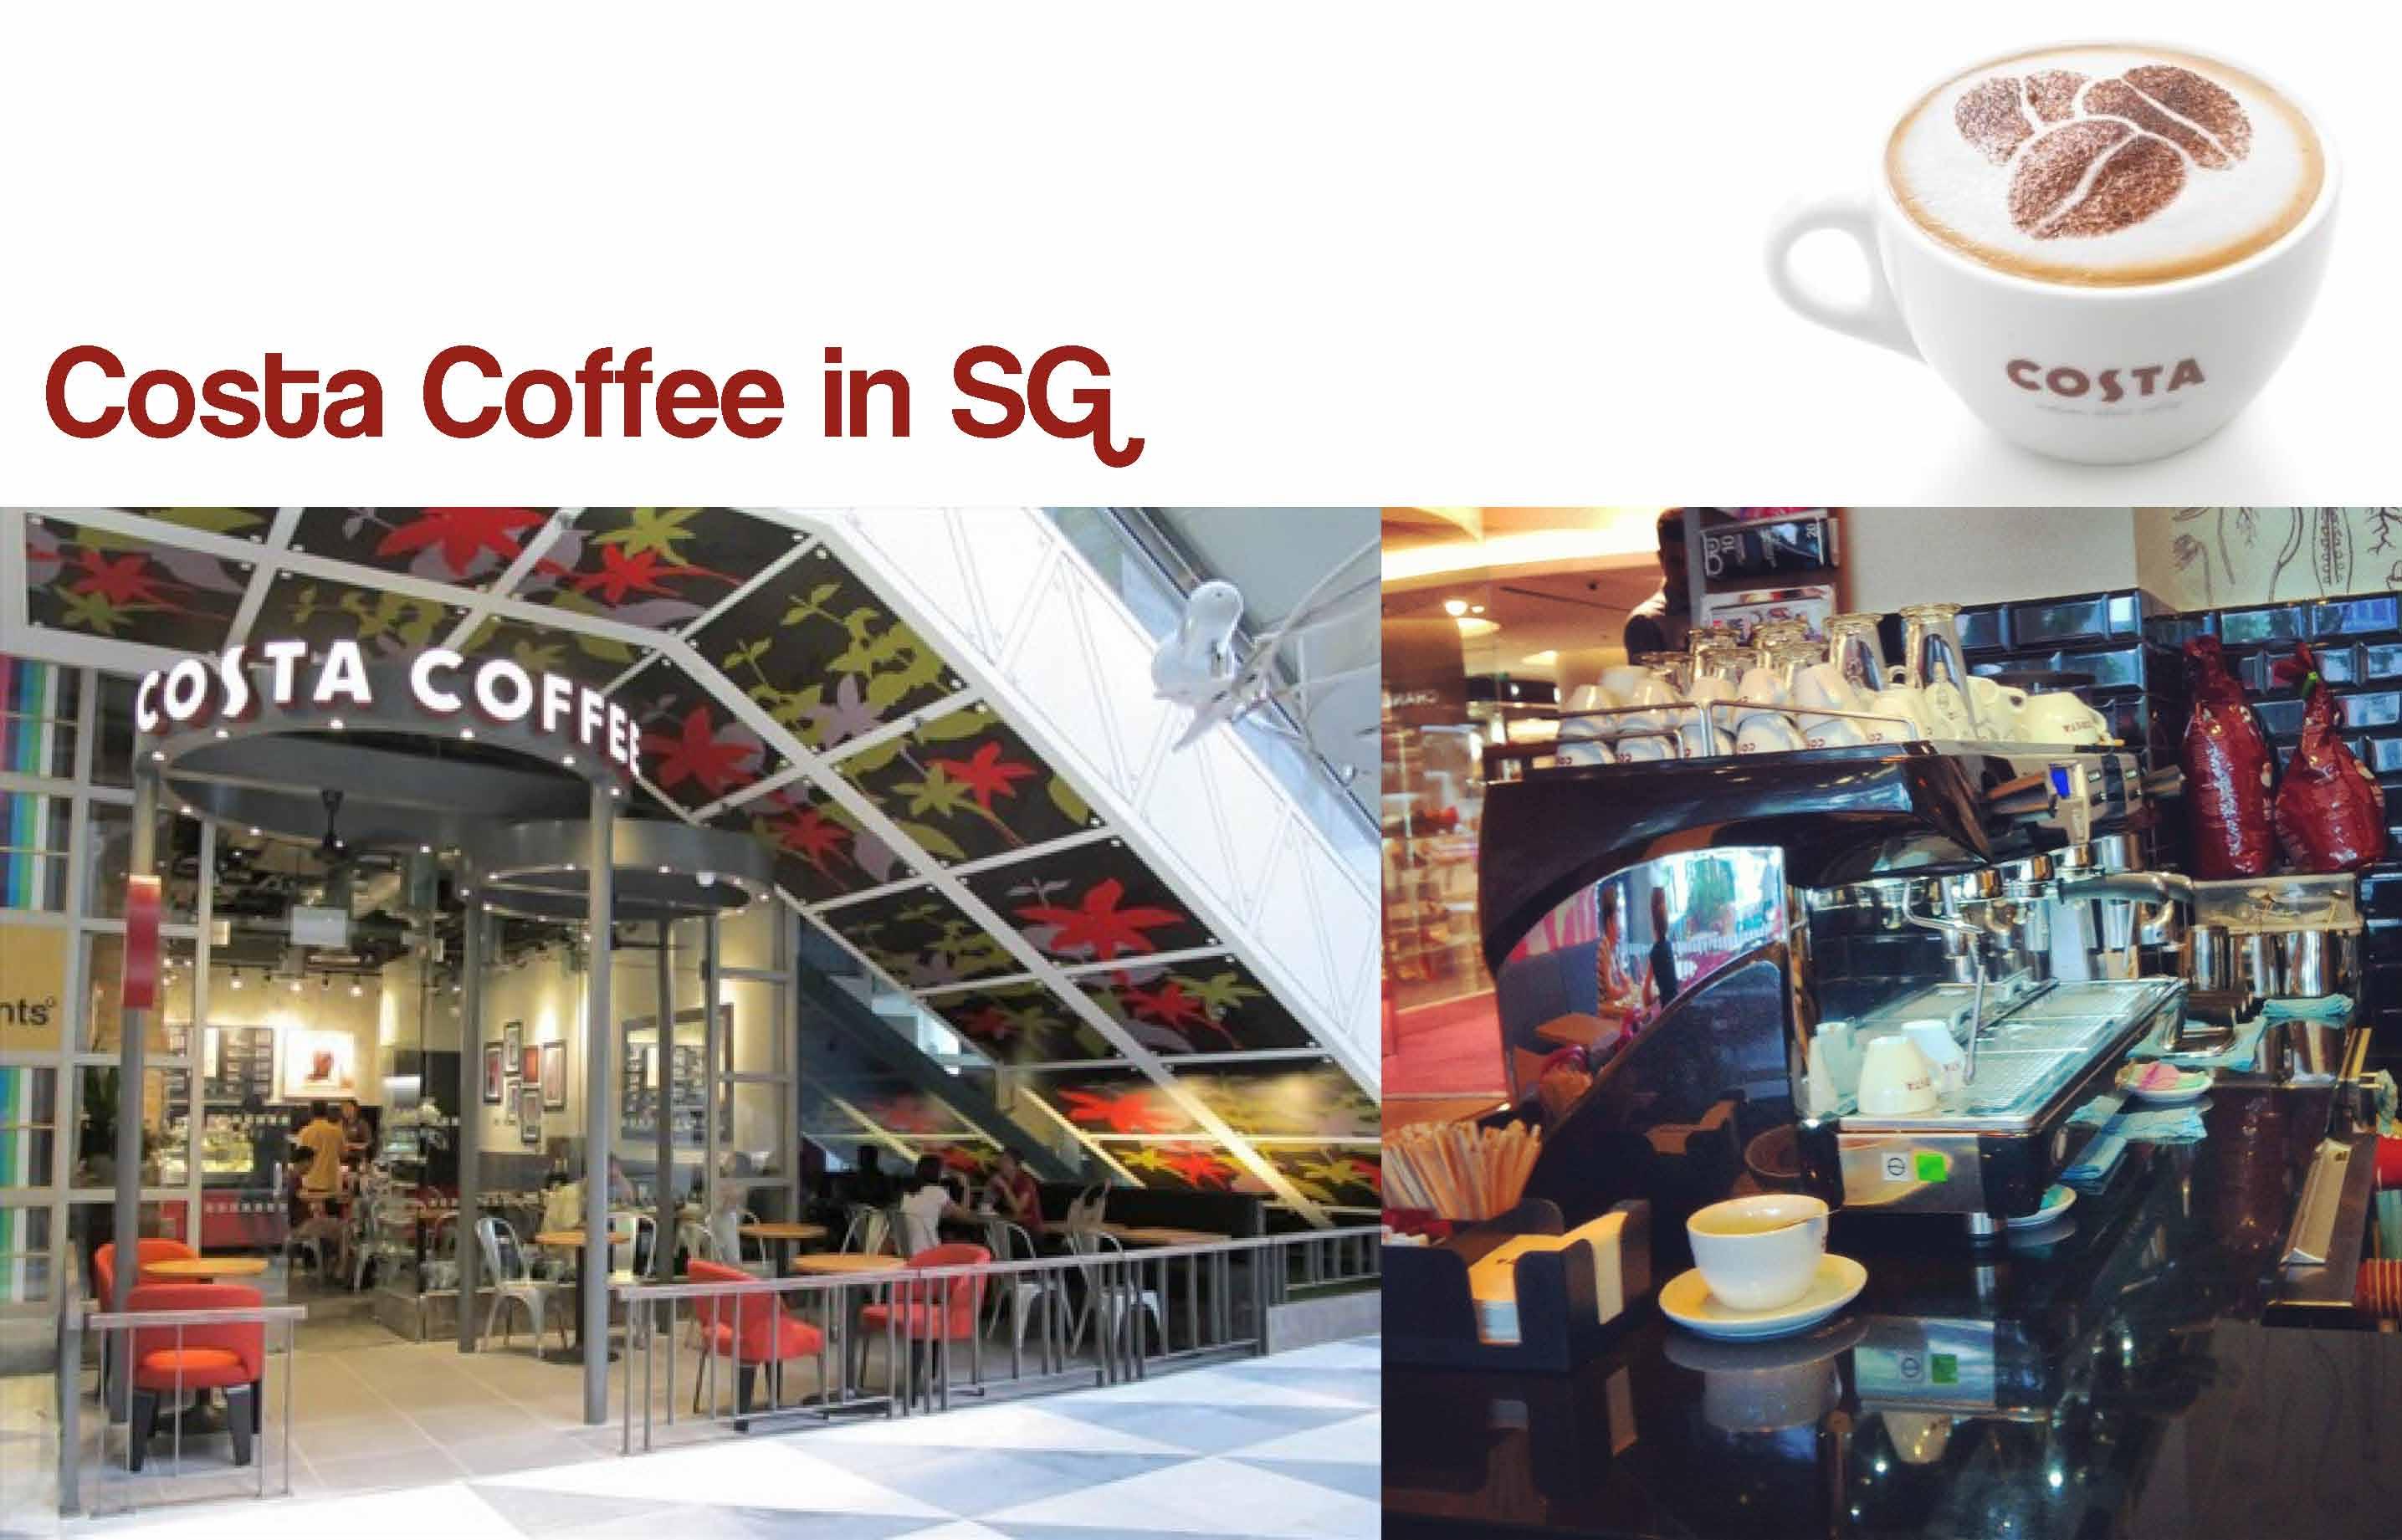 Costa coffee in SG